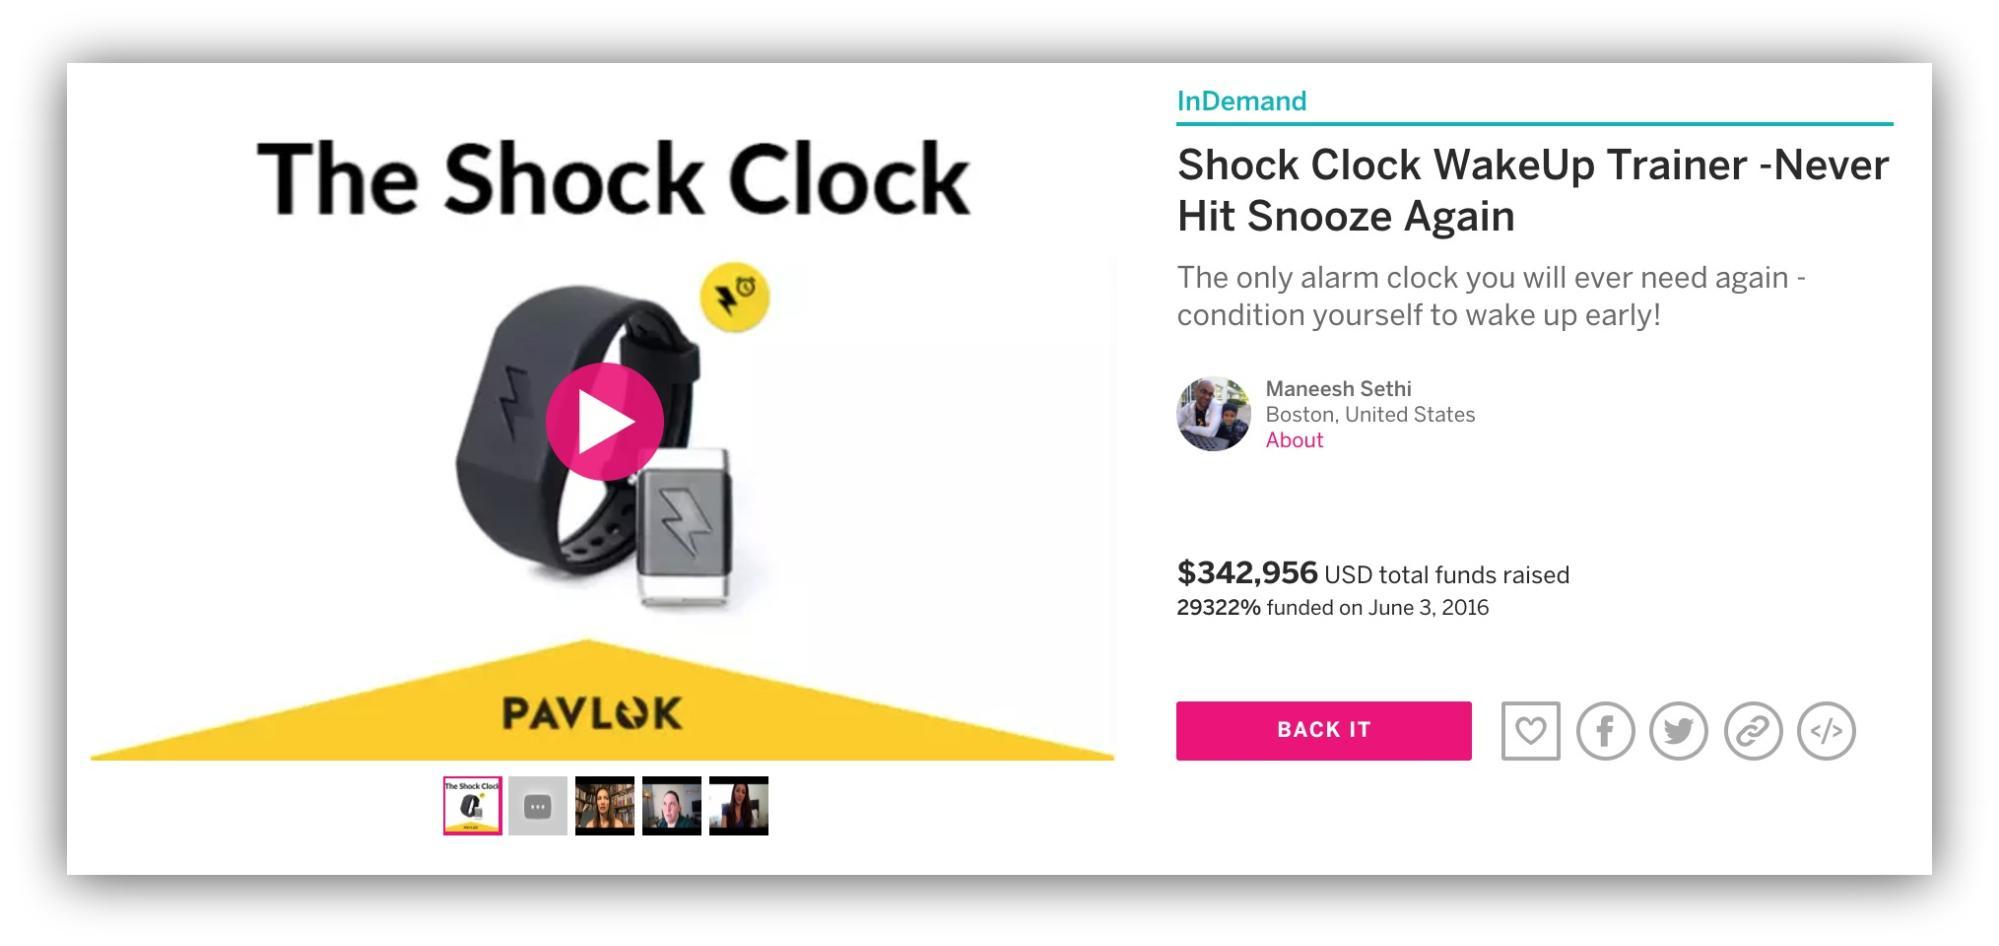 Screenshot showing a crowdsourcing campaign